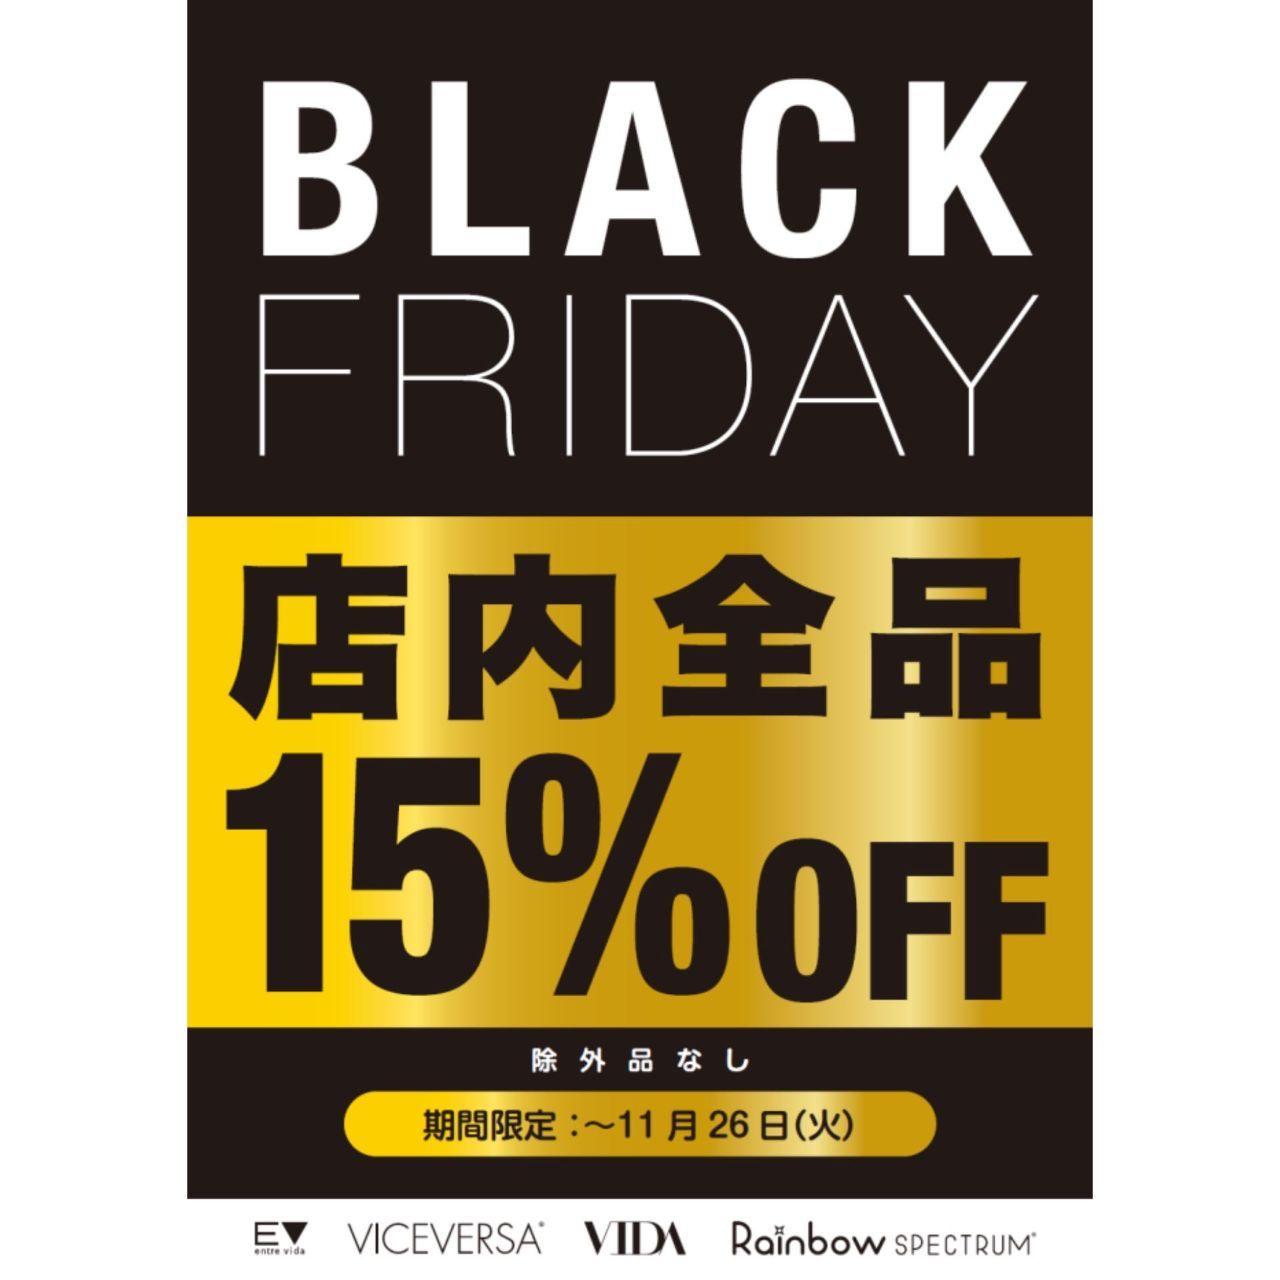 「【15%OFF】BLACK FRIDAY!!」の写真